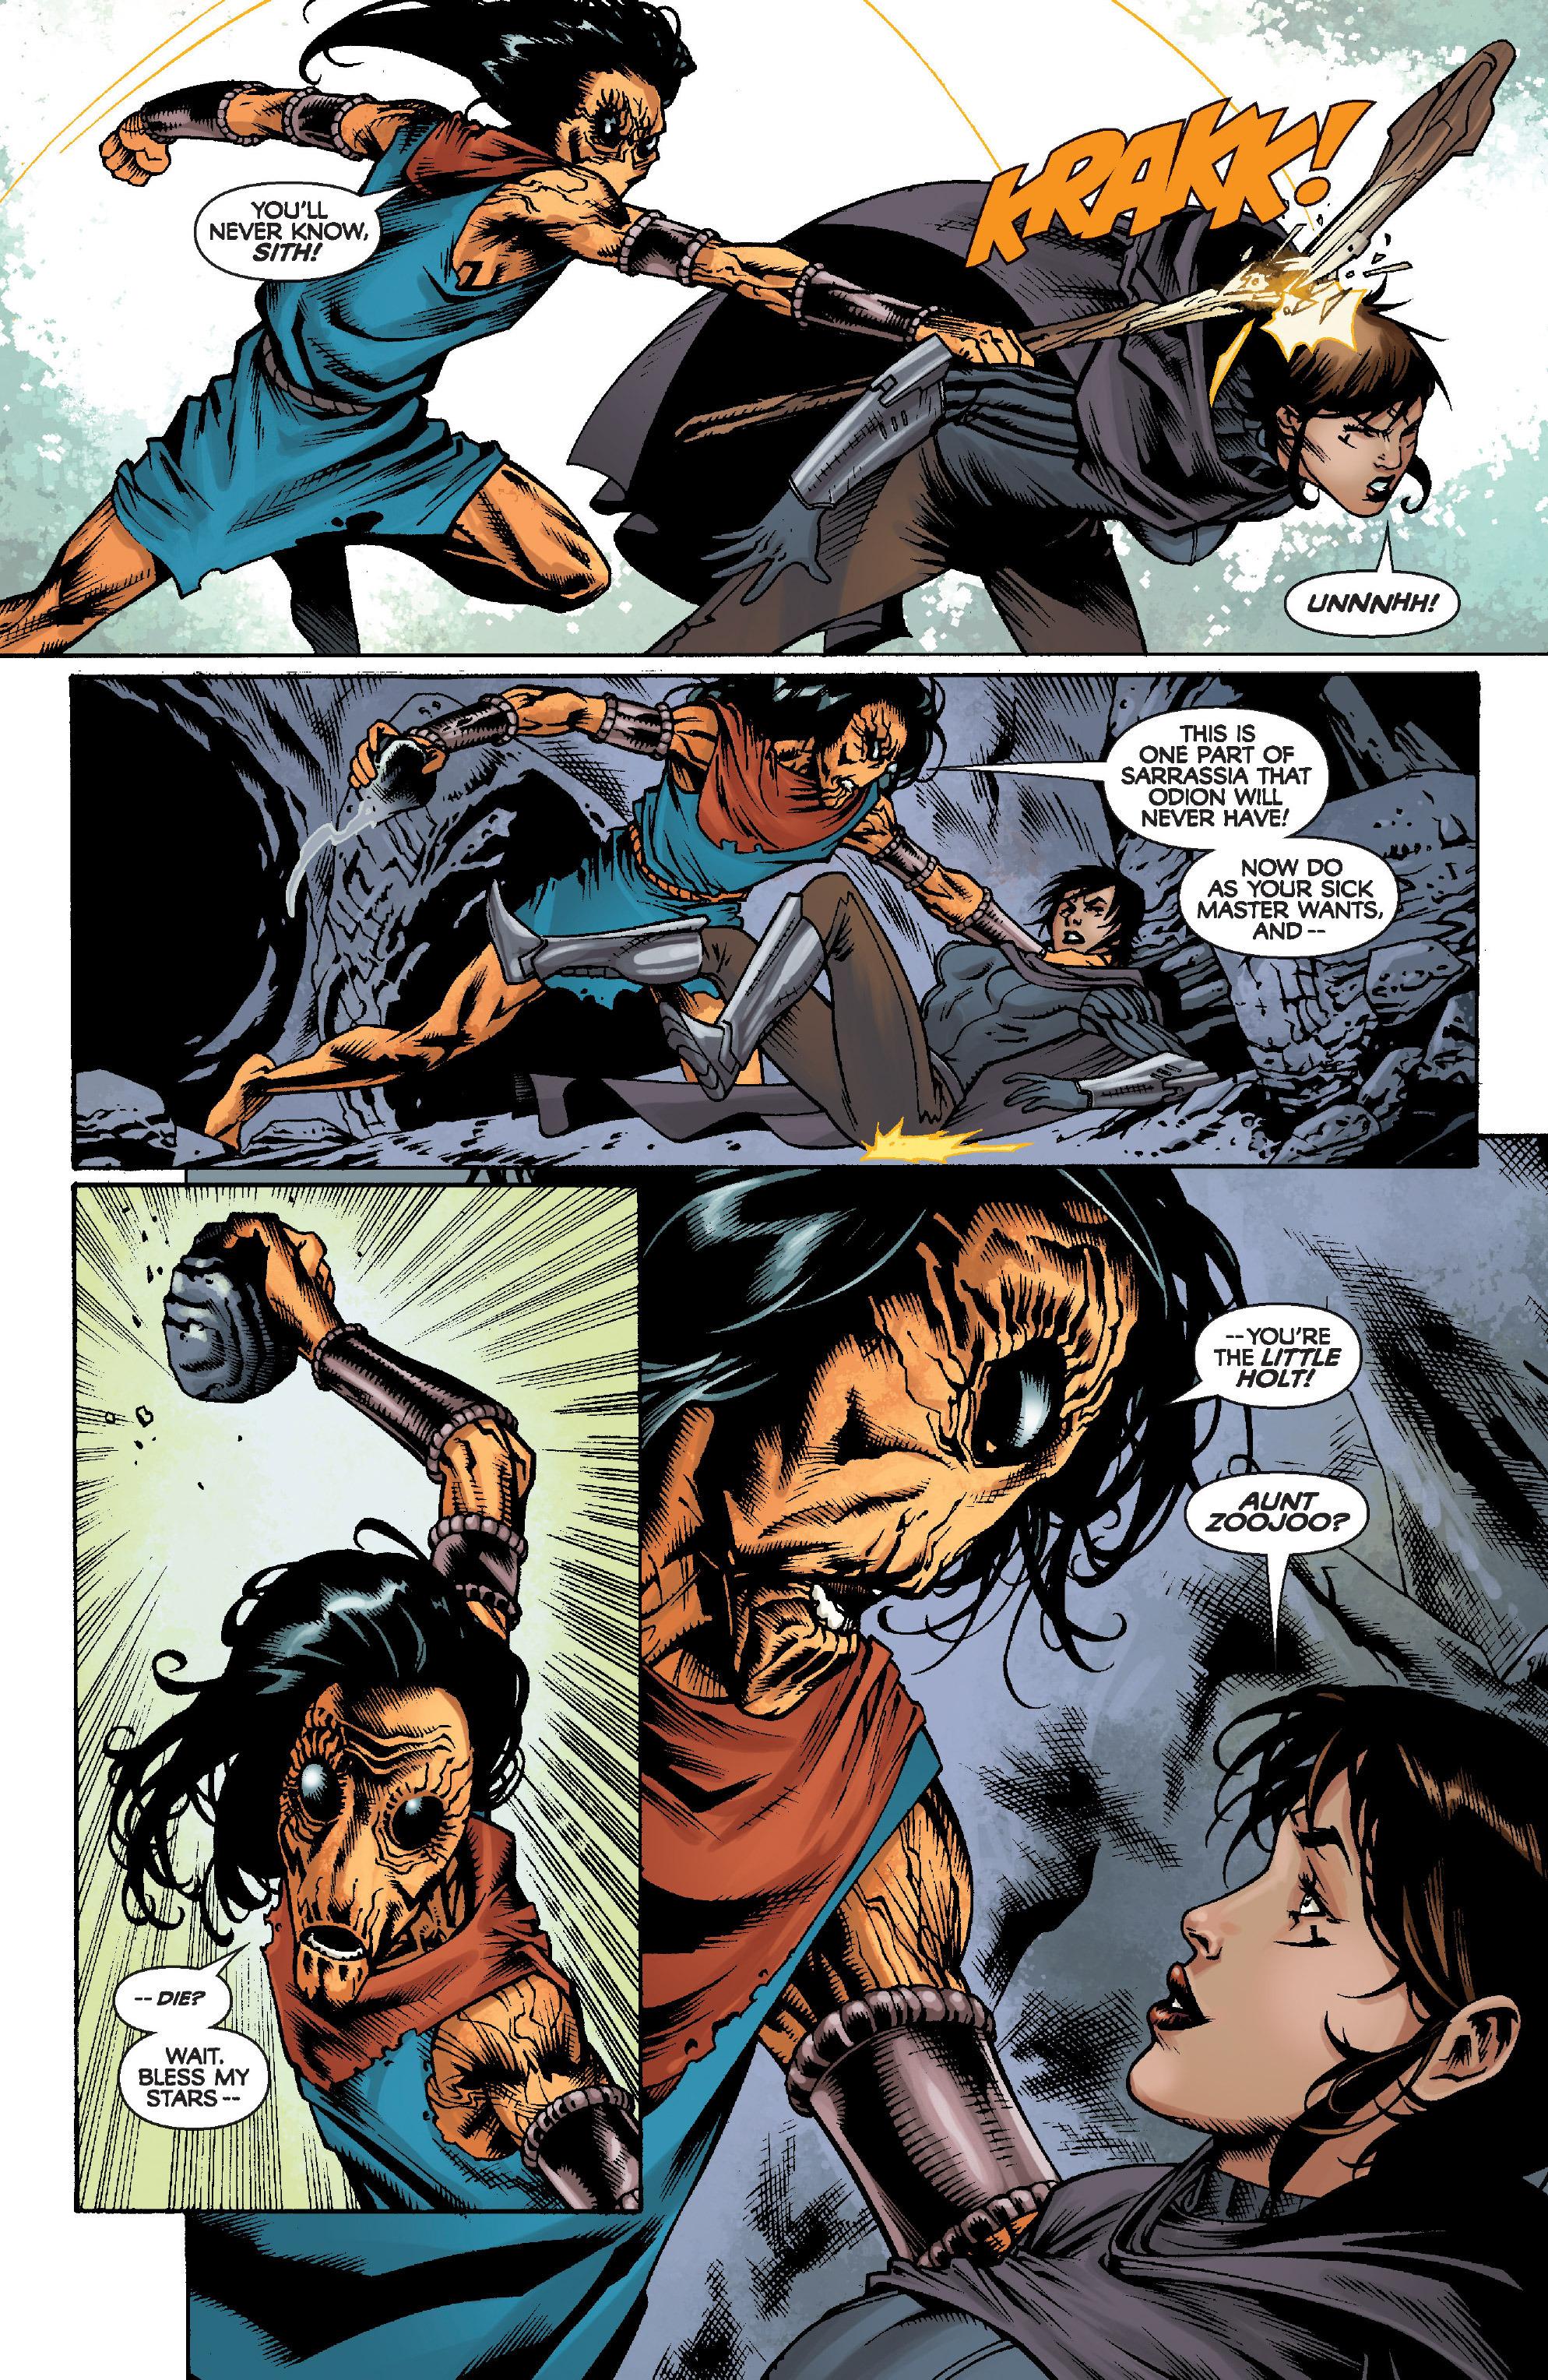 Read online Star Wars: Knight Errant - Escape comic -  Issue #2 - 13